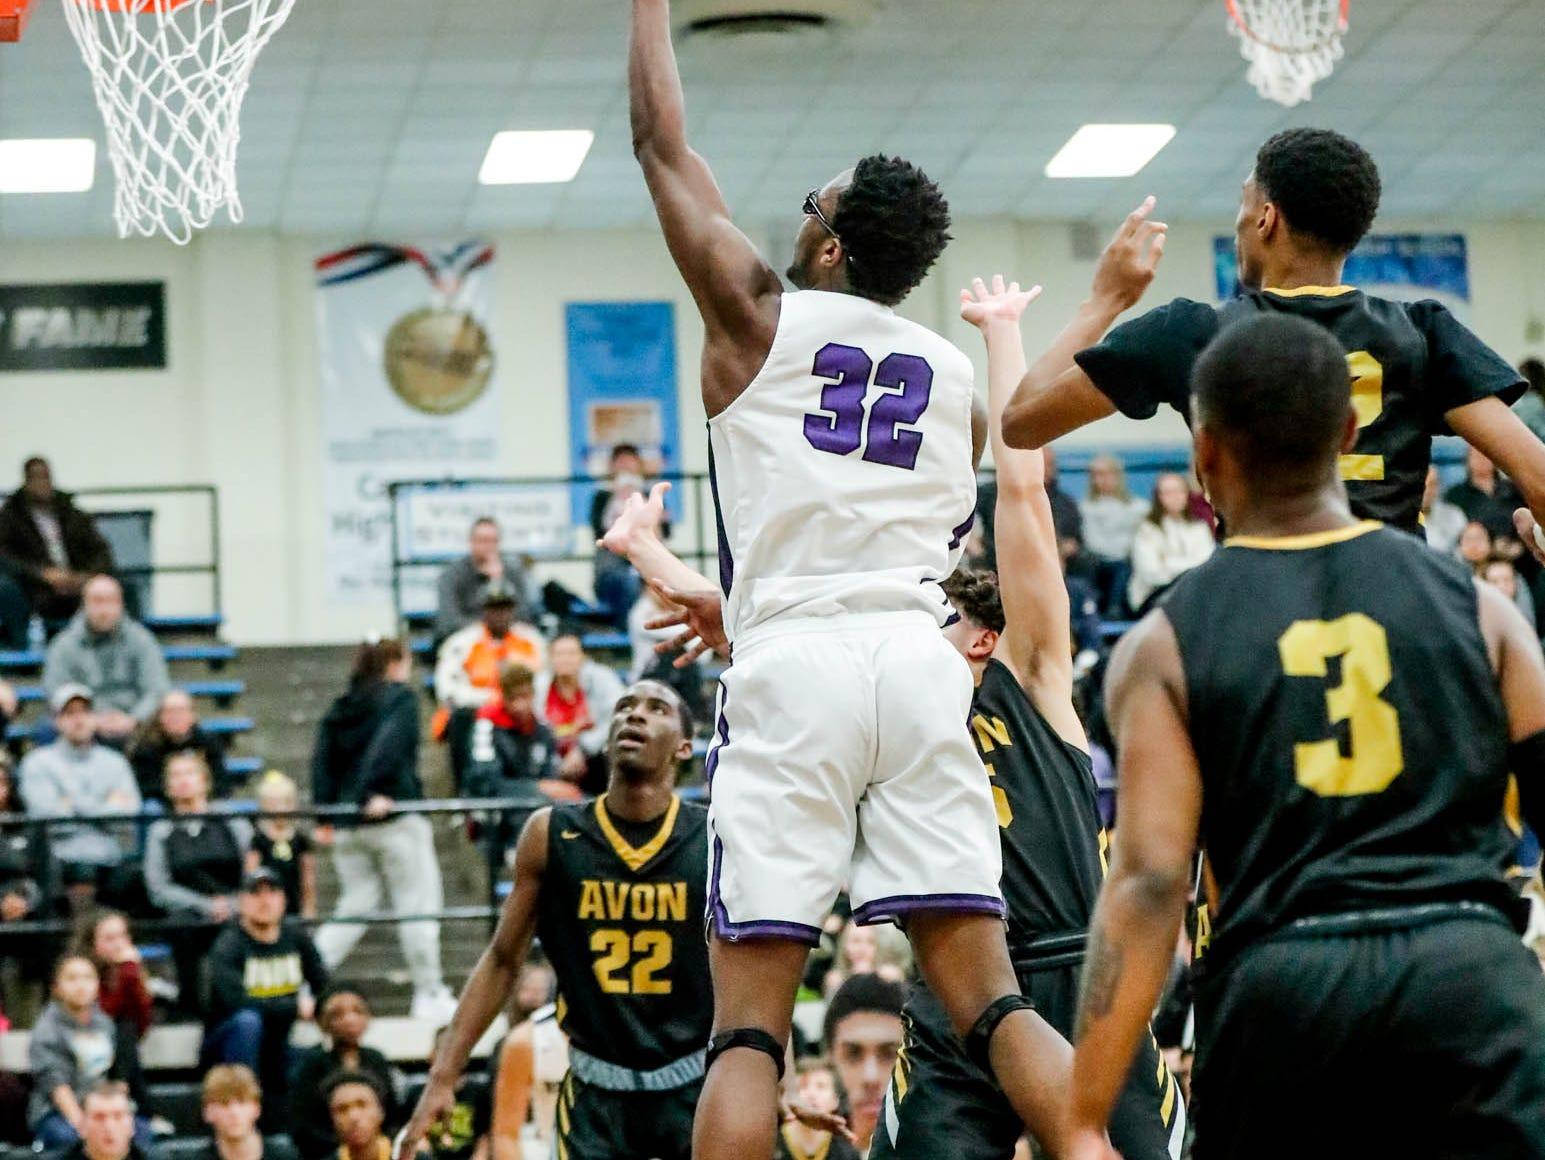 Brownsburg High School's Malek Edmonds (32) shoots afor the hoop during the 2019 Hendricks County Basketball Tournament game between the Avon High School boys varsity basketball team and Brownsburg High School, held at Cascade High School on Saturday, Jan. 5, 2019.